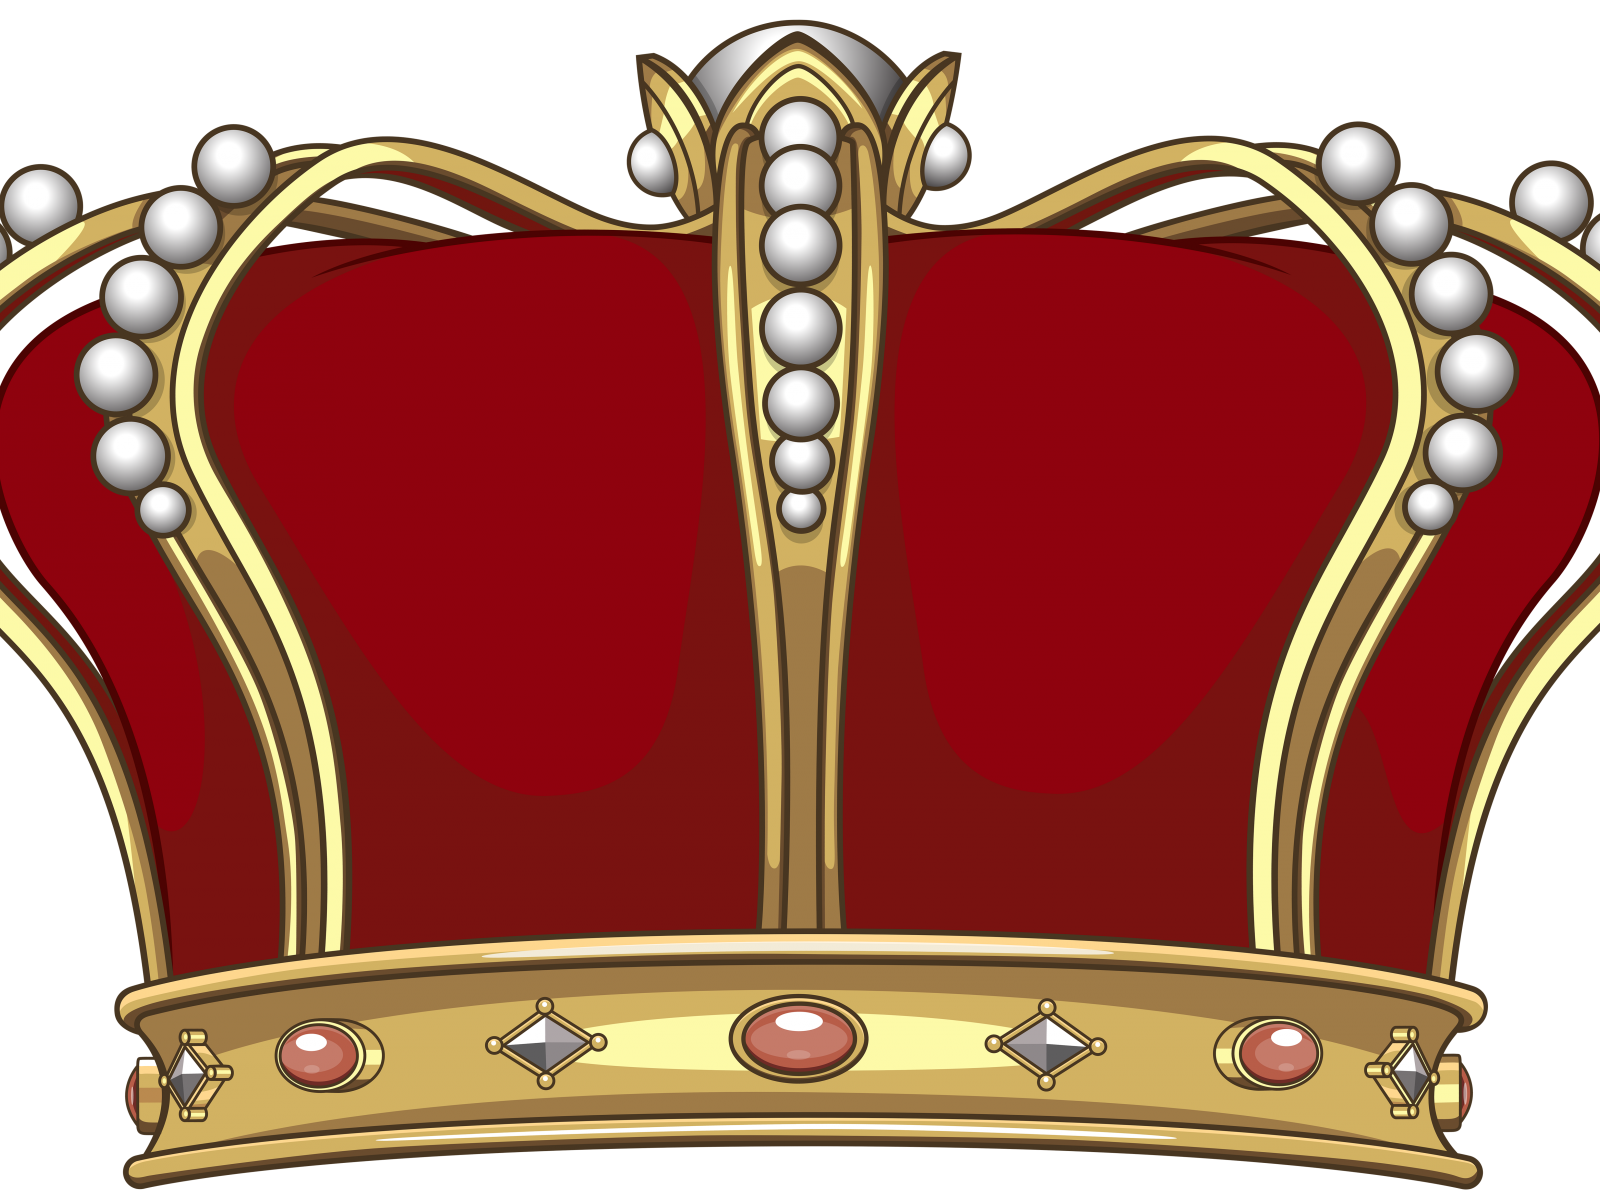 Kings x carwad net. Crown clipart king's